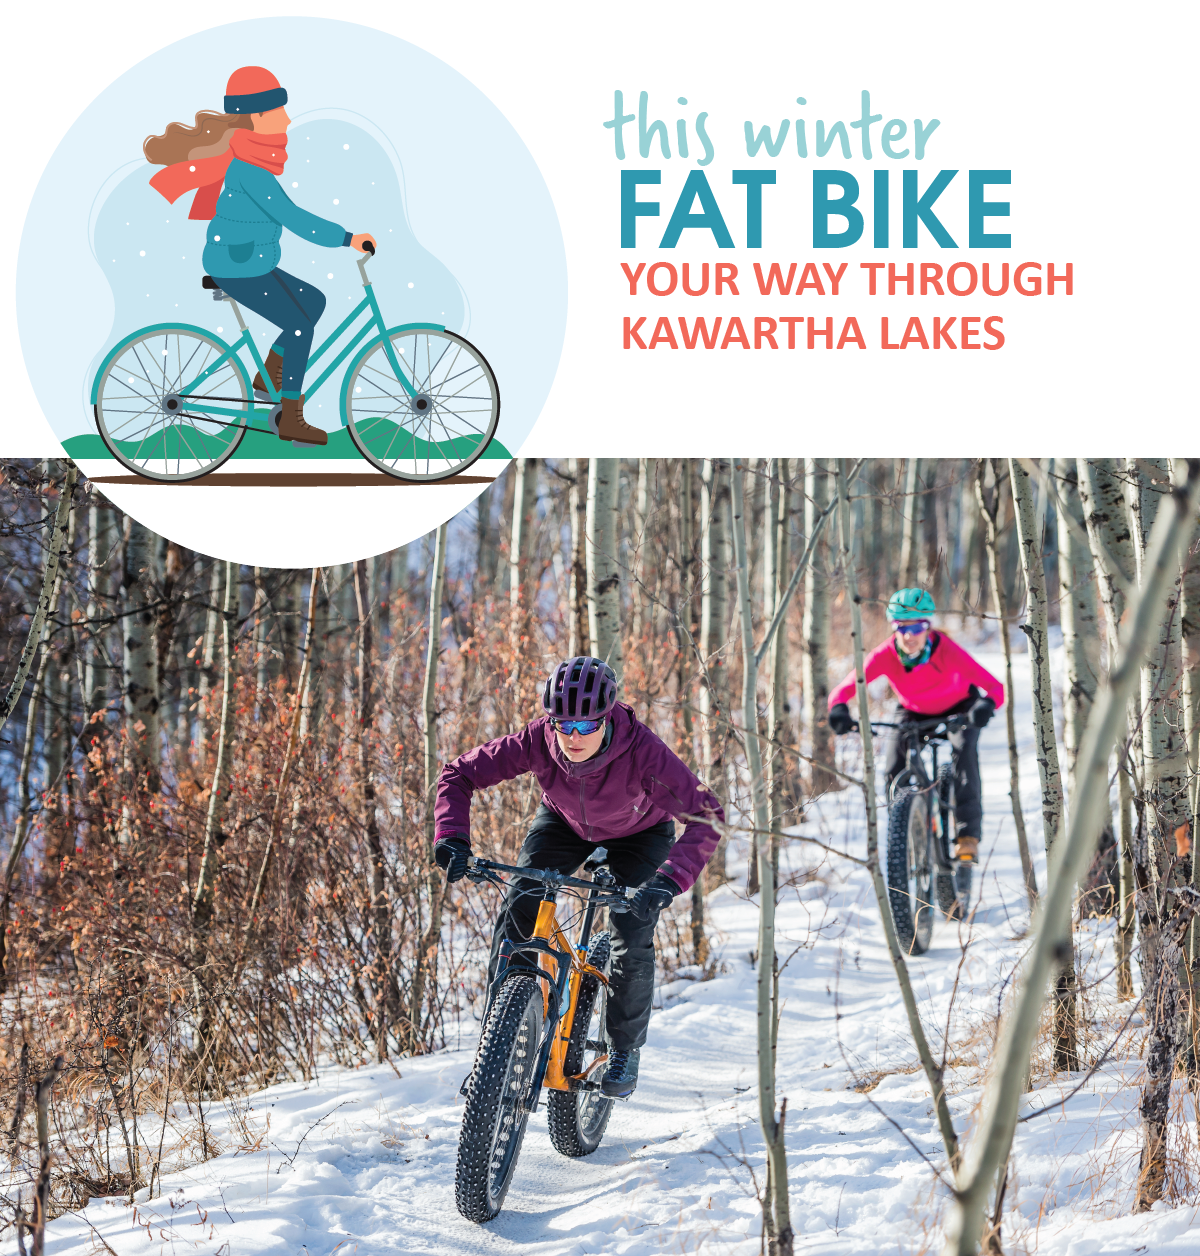 Fat bike your way through Kawartha Lakes